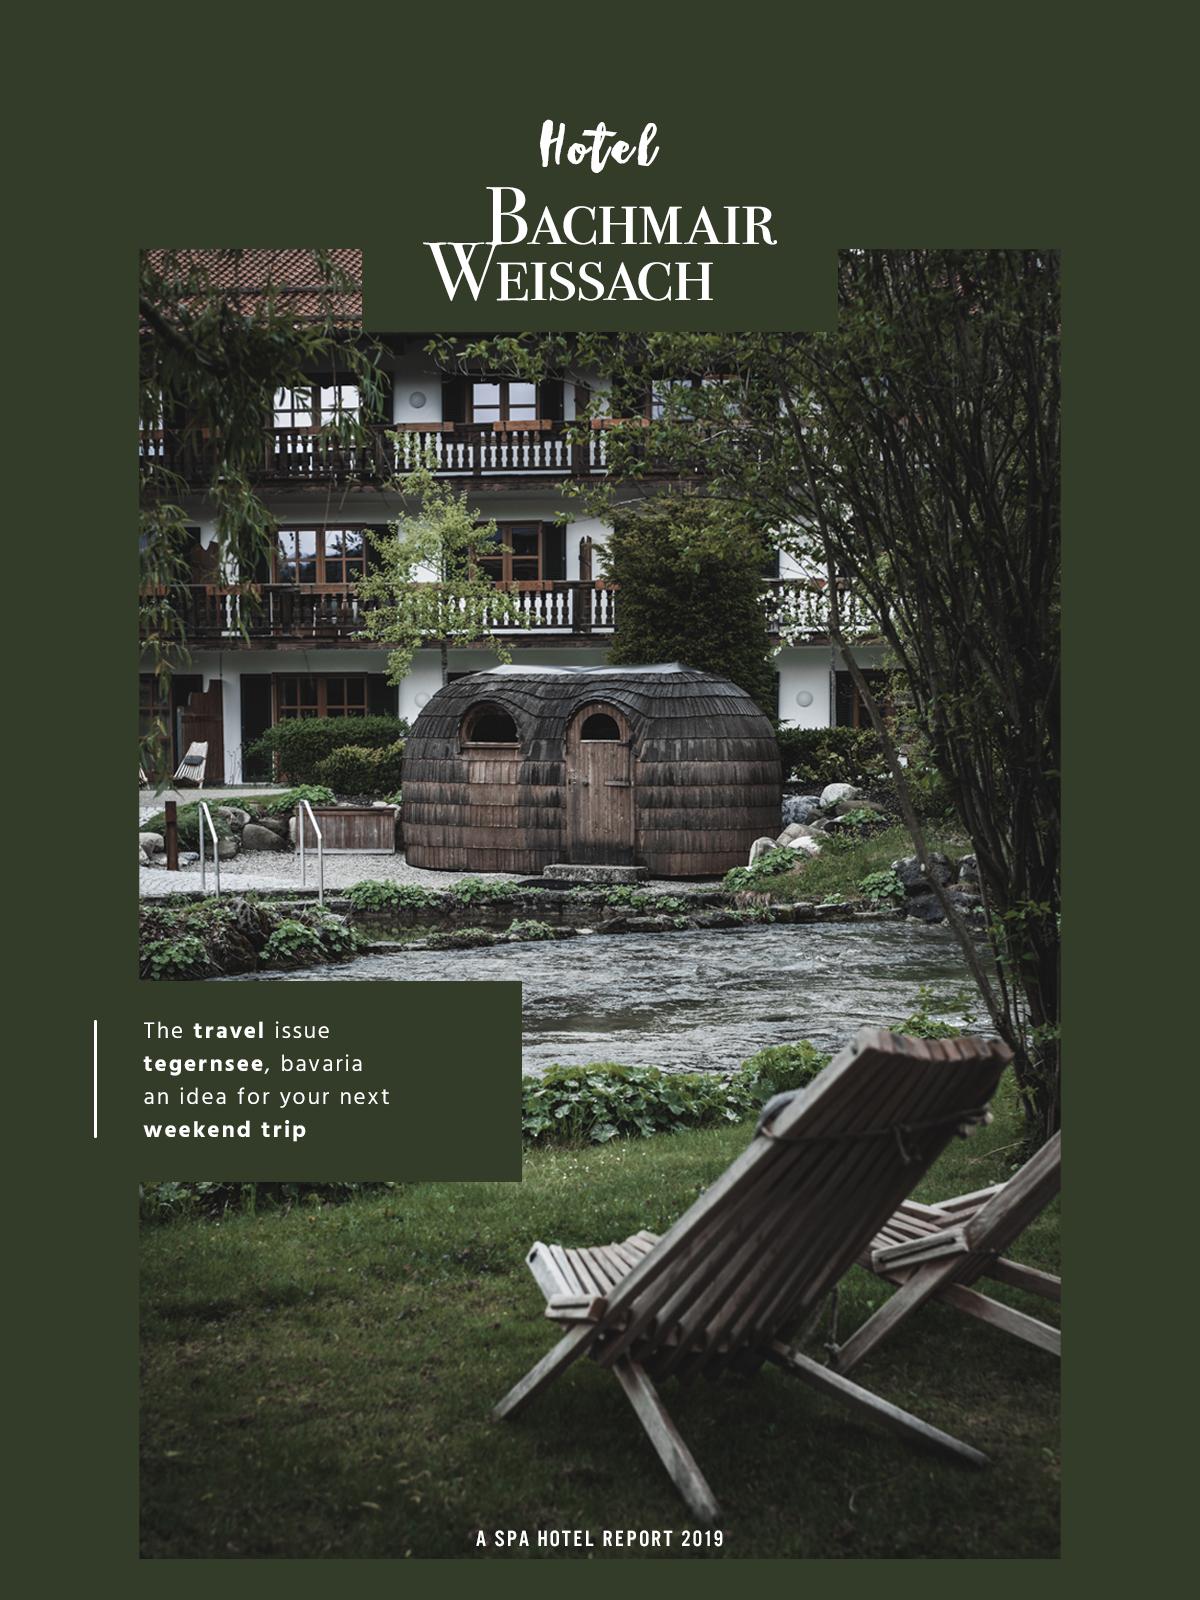 Bachmair Weissach Hotel.jpg